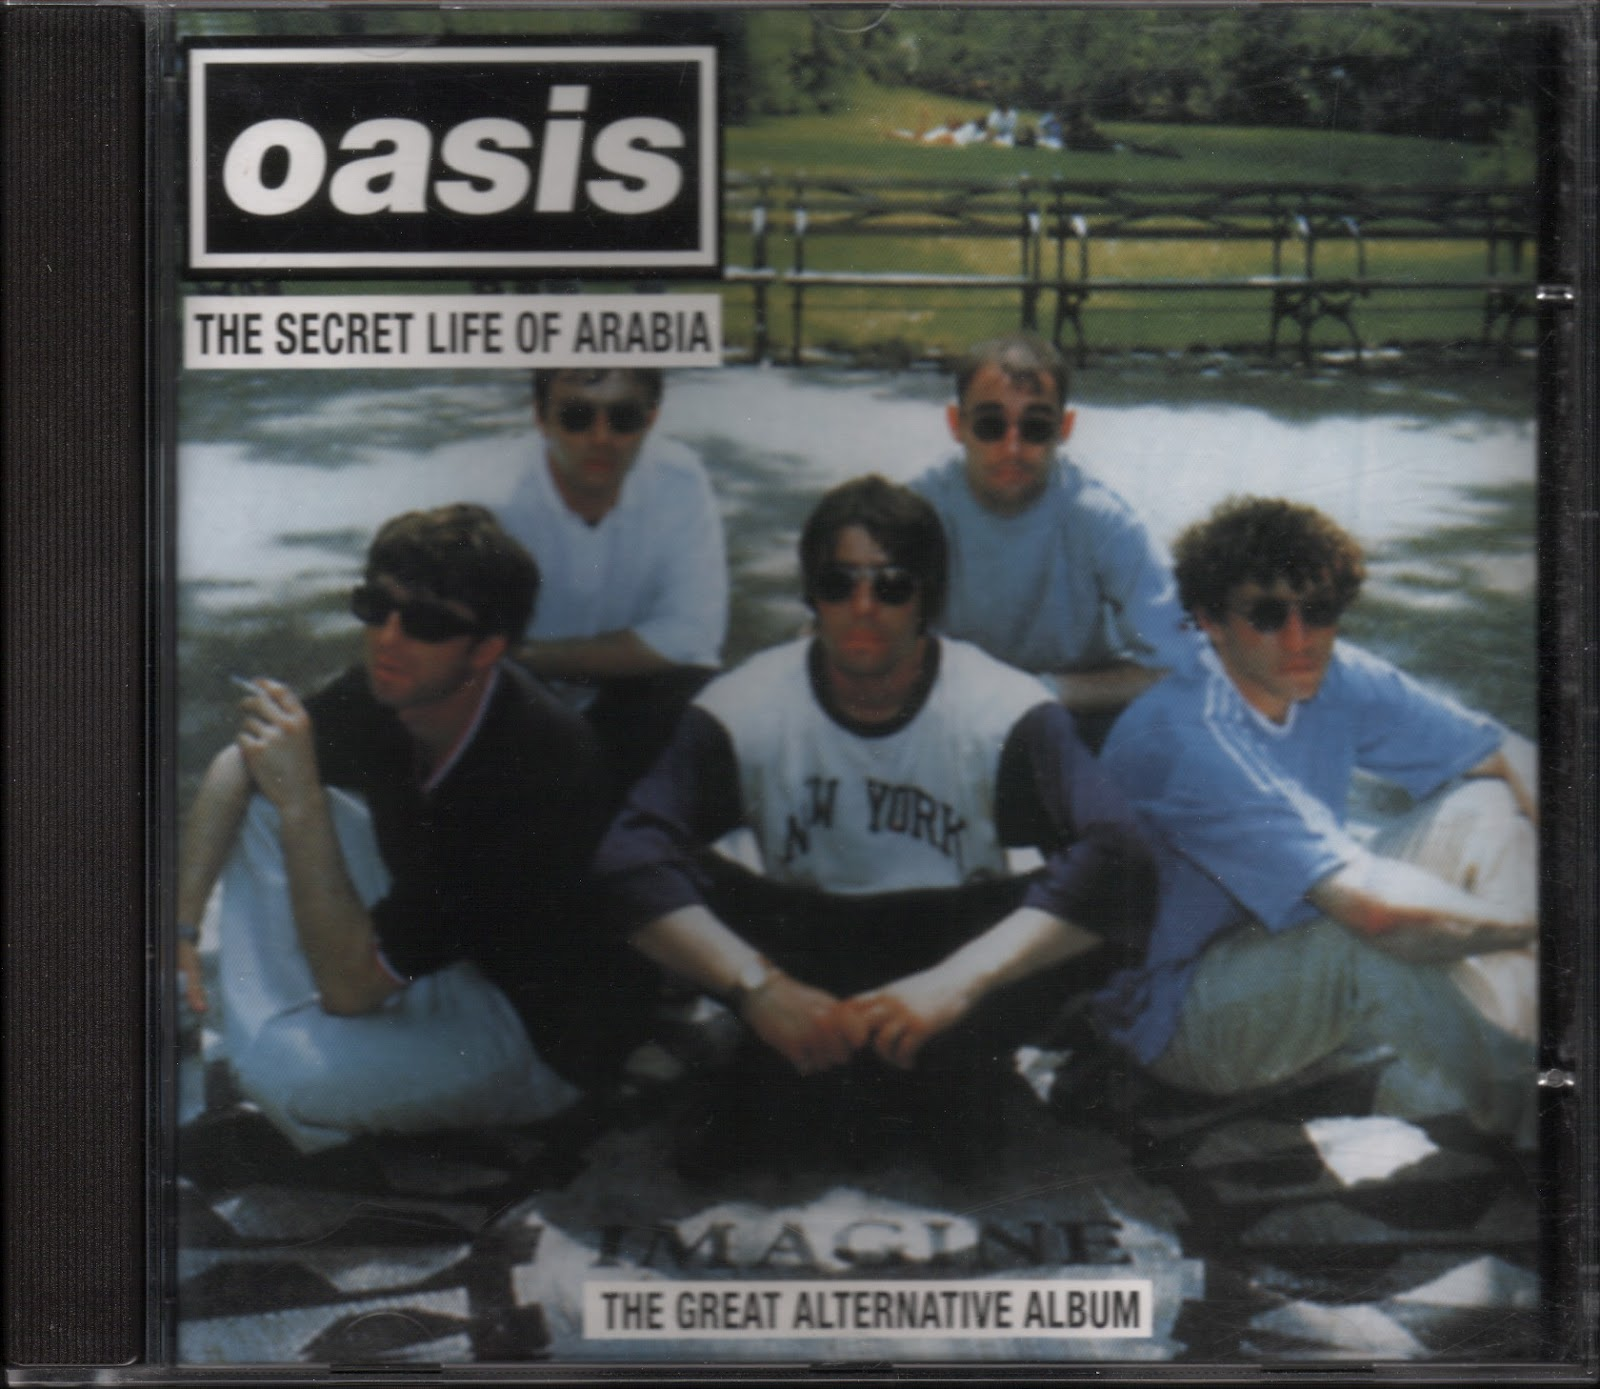 Oasis Bootlegs From Fuckuoka: The Great Alternative Album